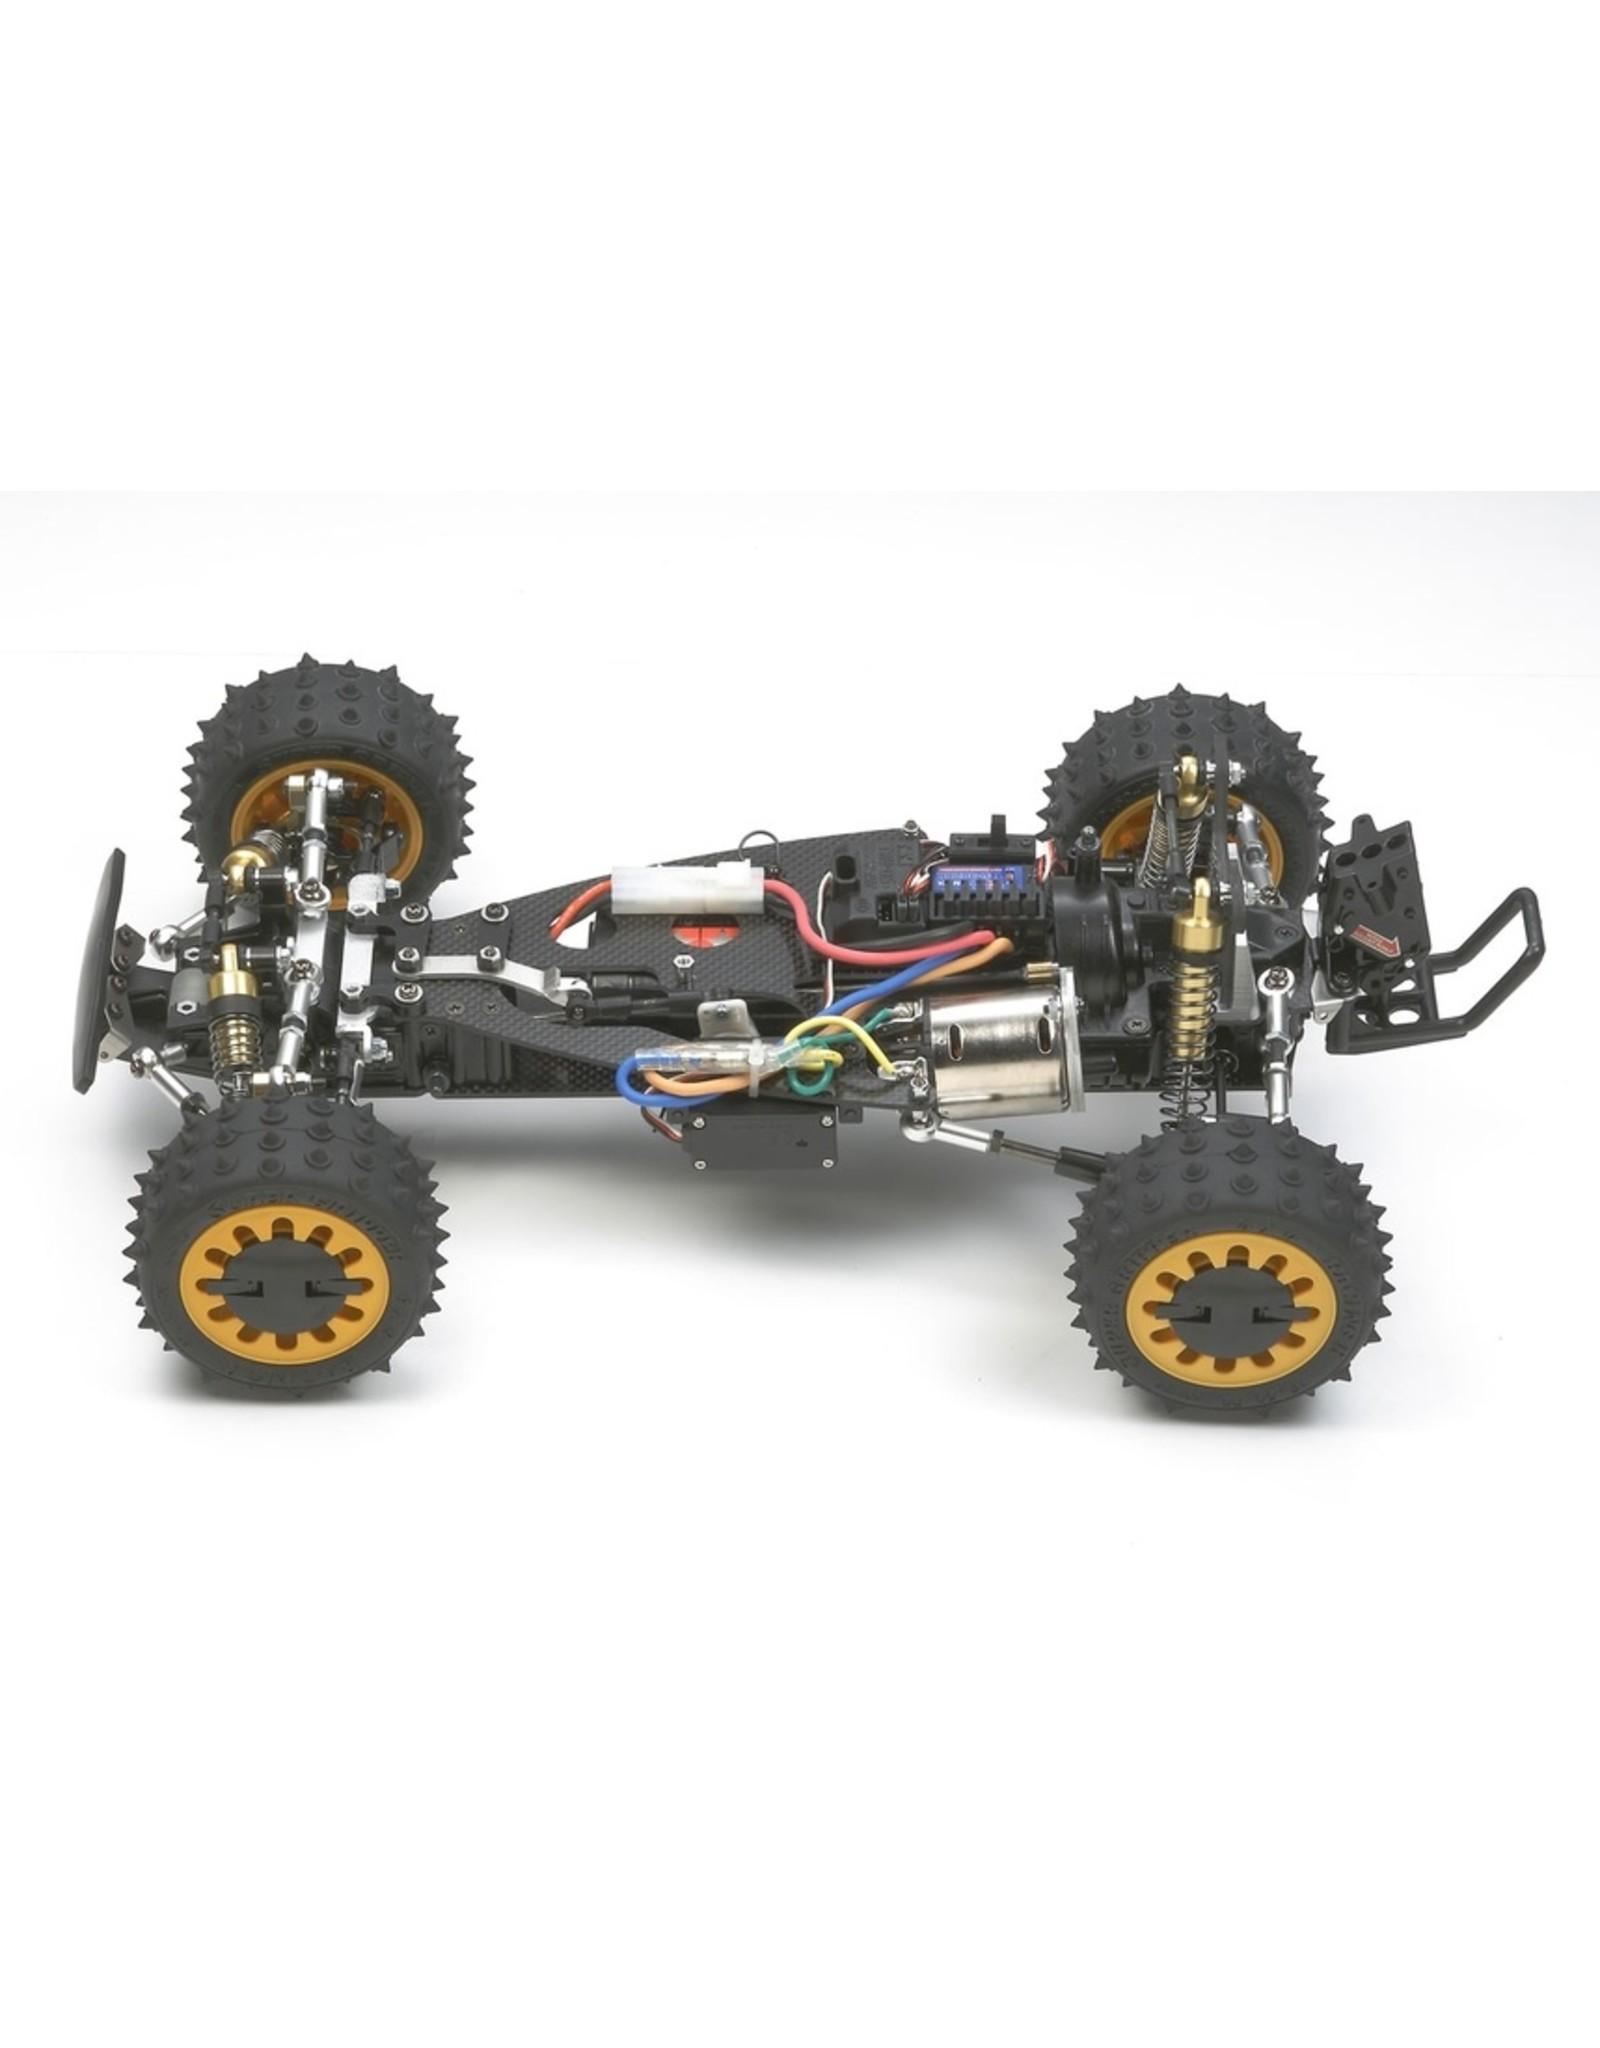 Tamiya 1/10 Avante 2011 Off-Road Buggy Kit